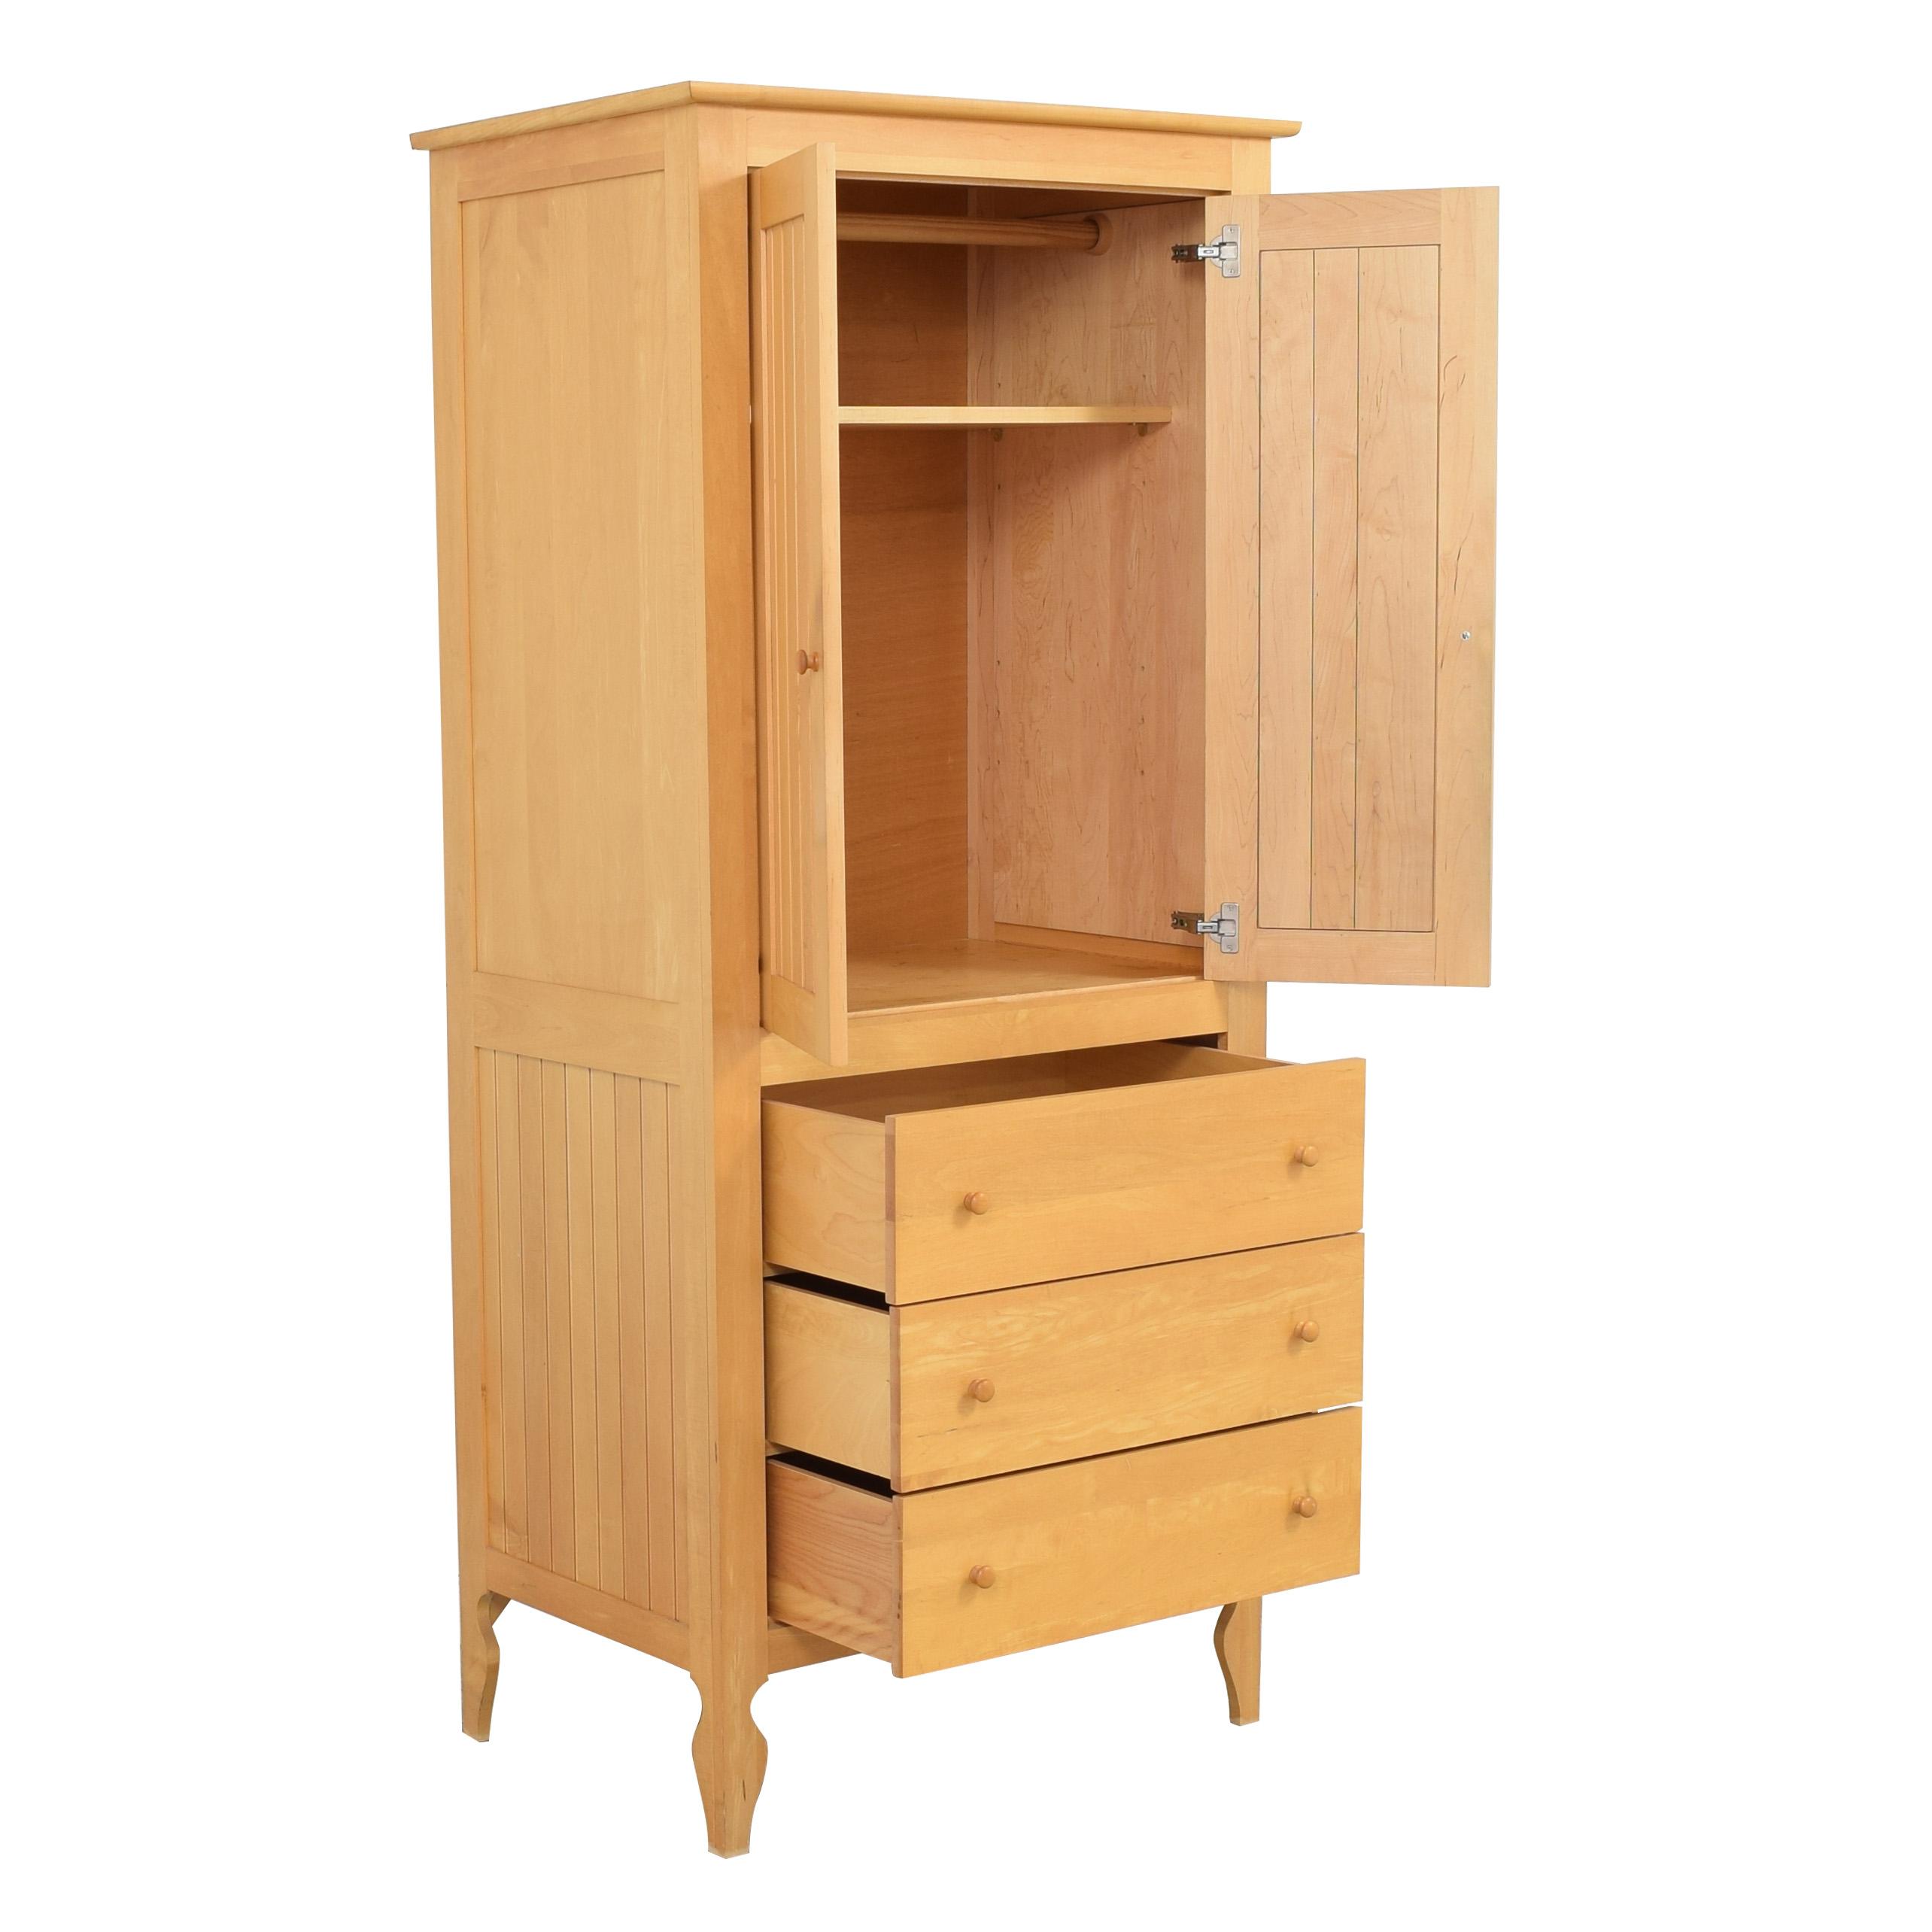 Crate & Barrel Crate & Barrel Bedroom Armoire